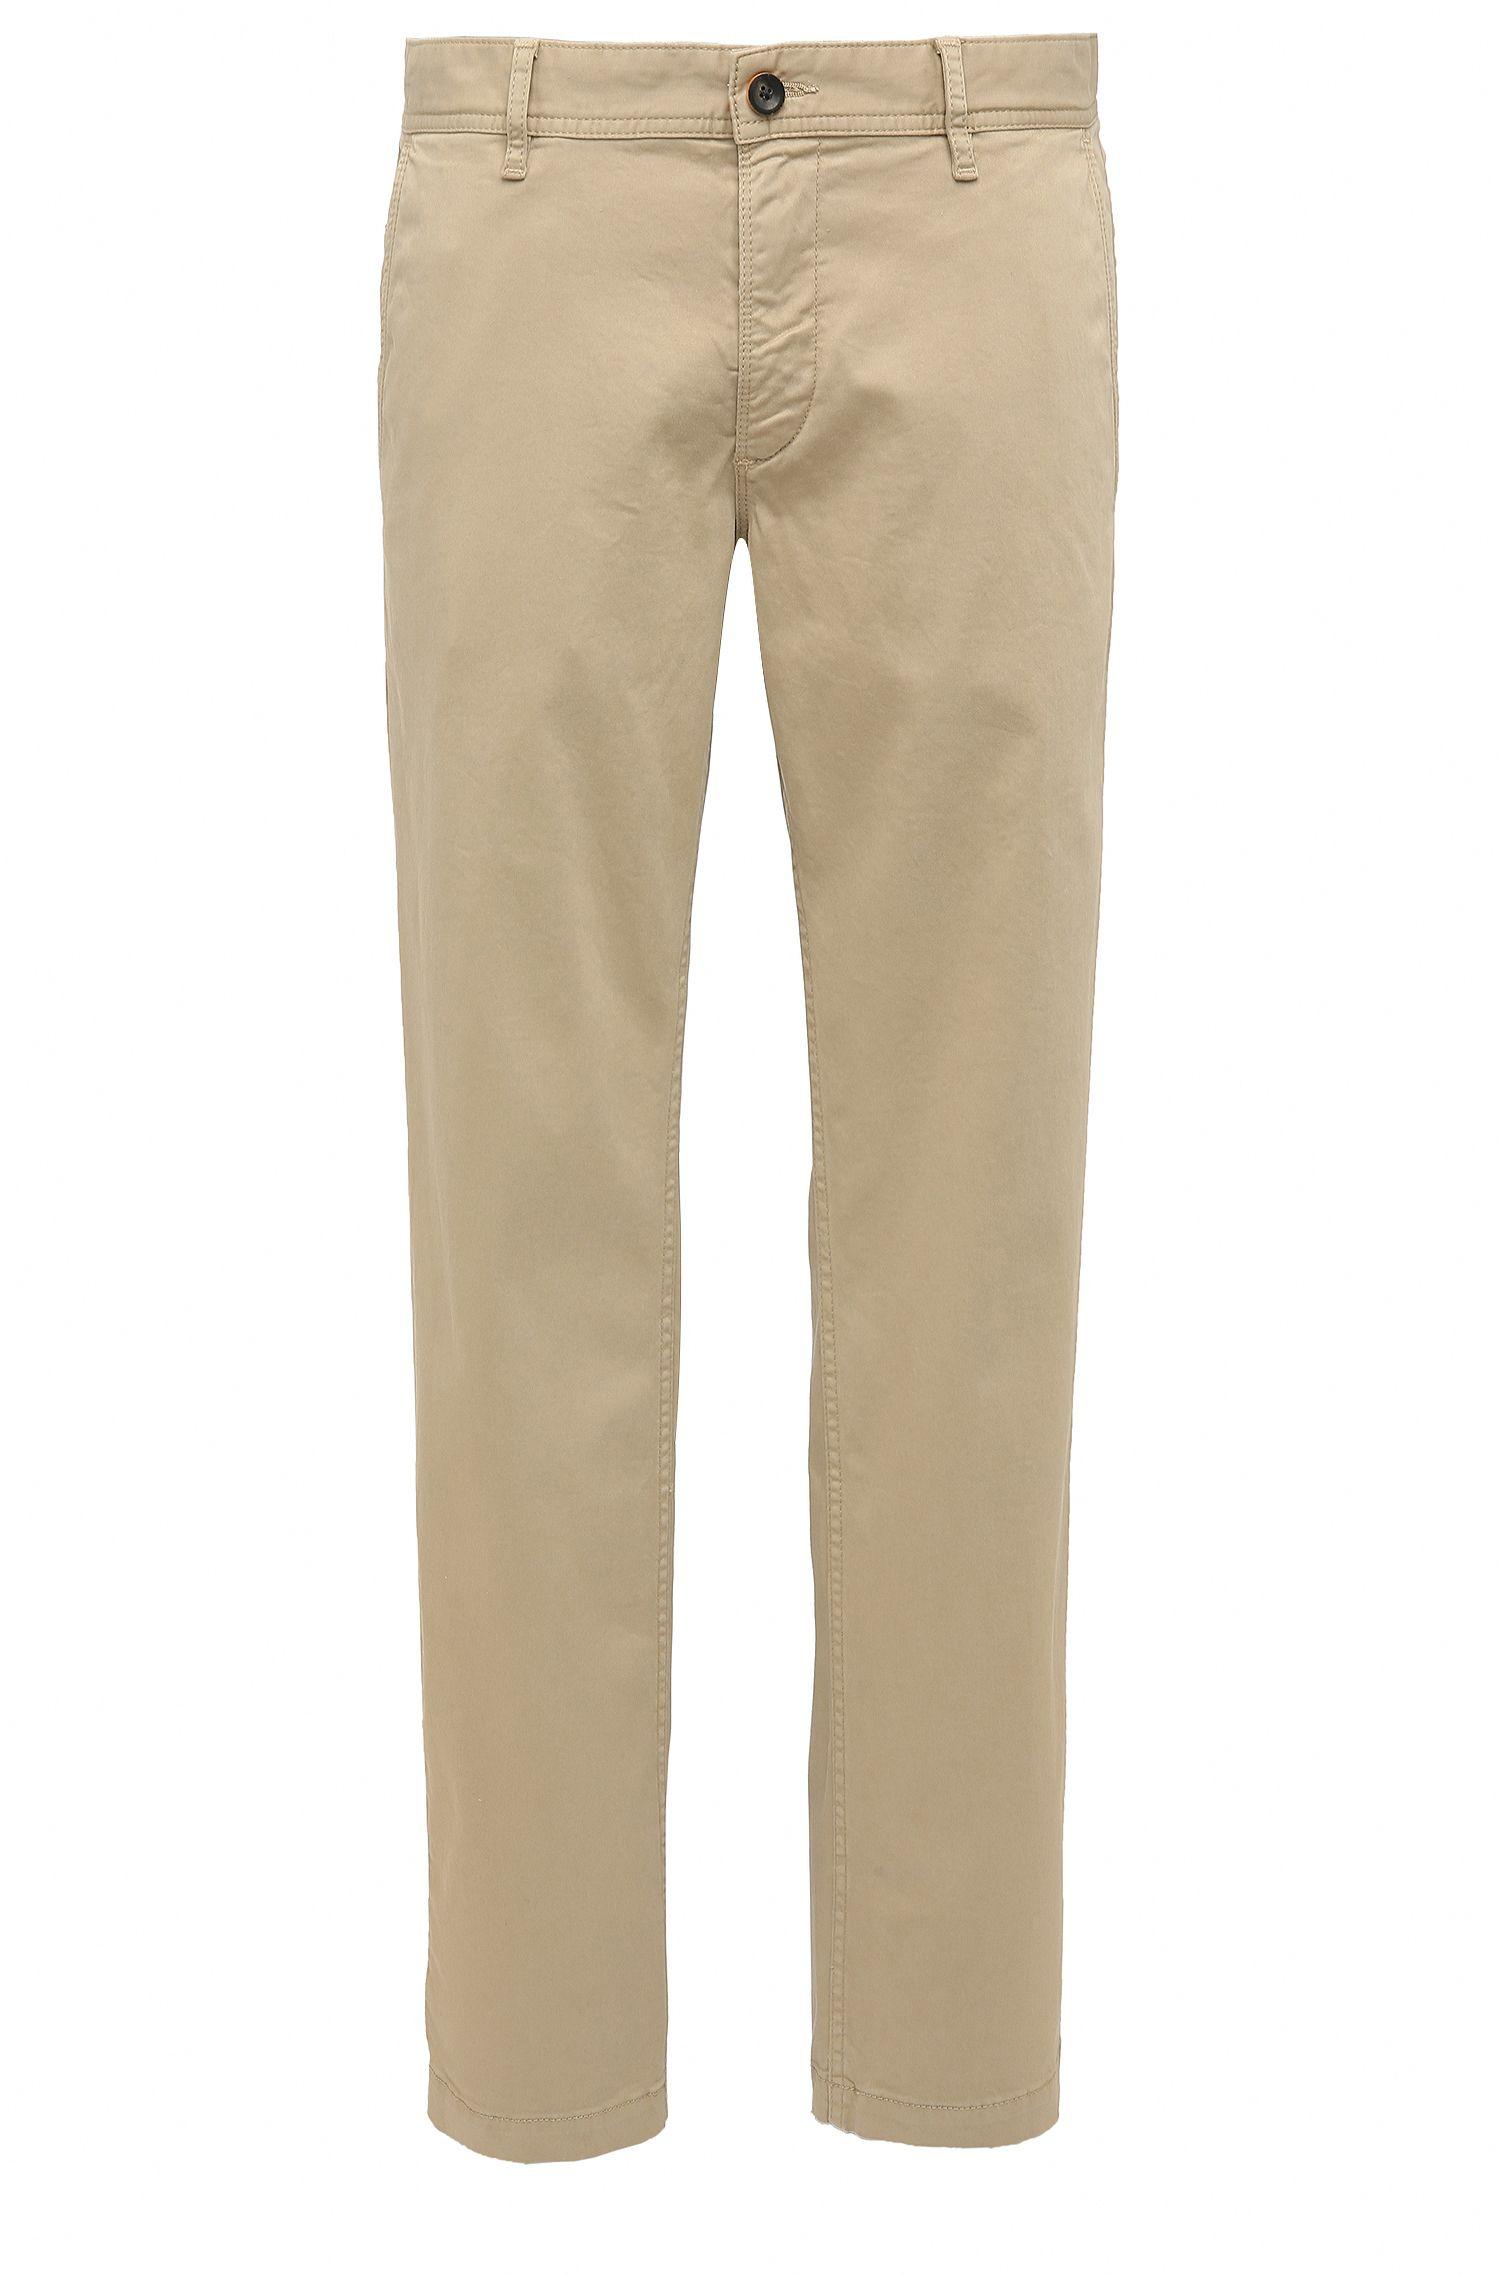 'Schino Regular D' | Regular Fit, Stretch Cotton Chinos